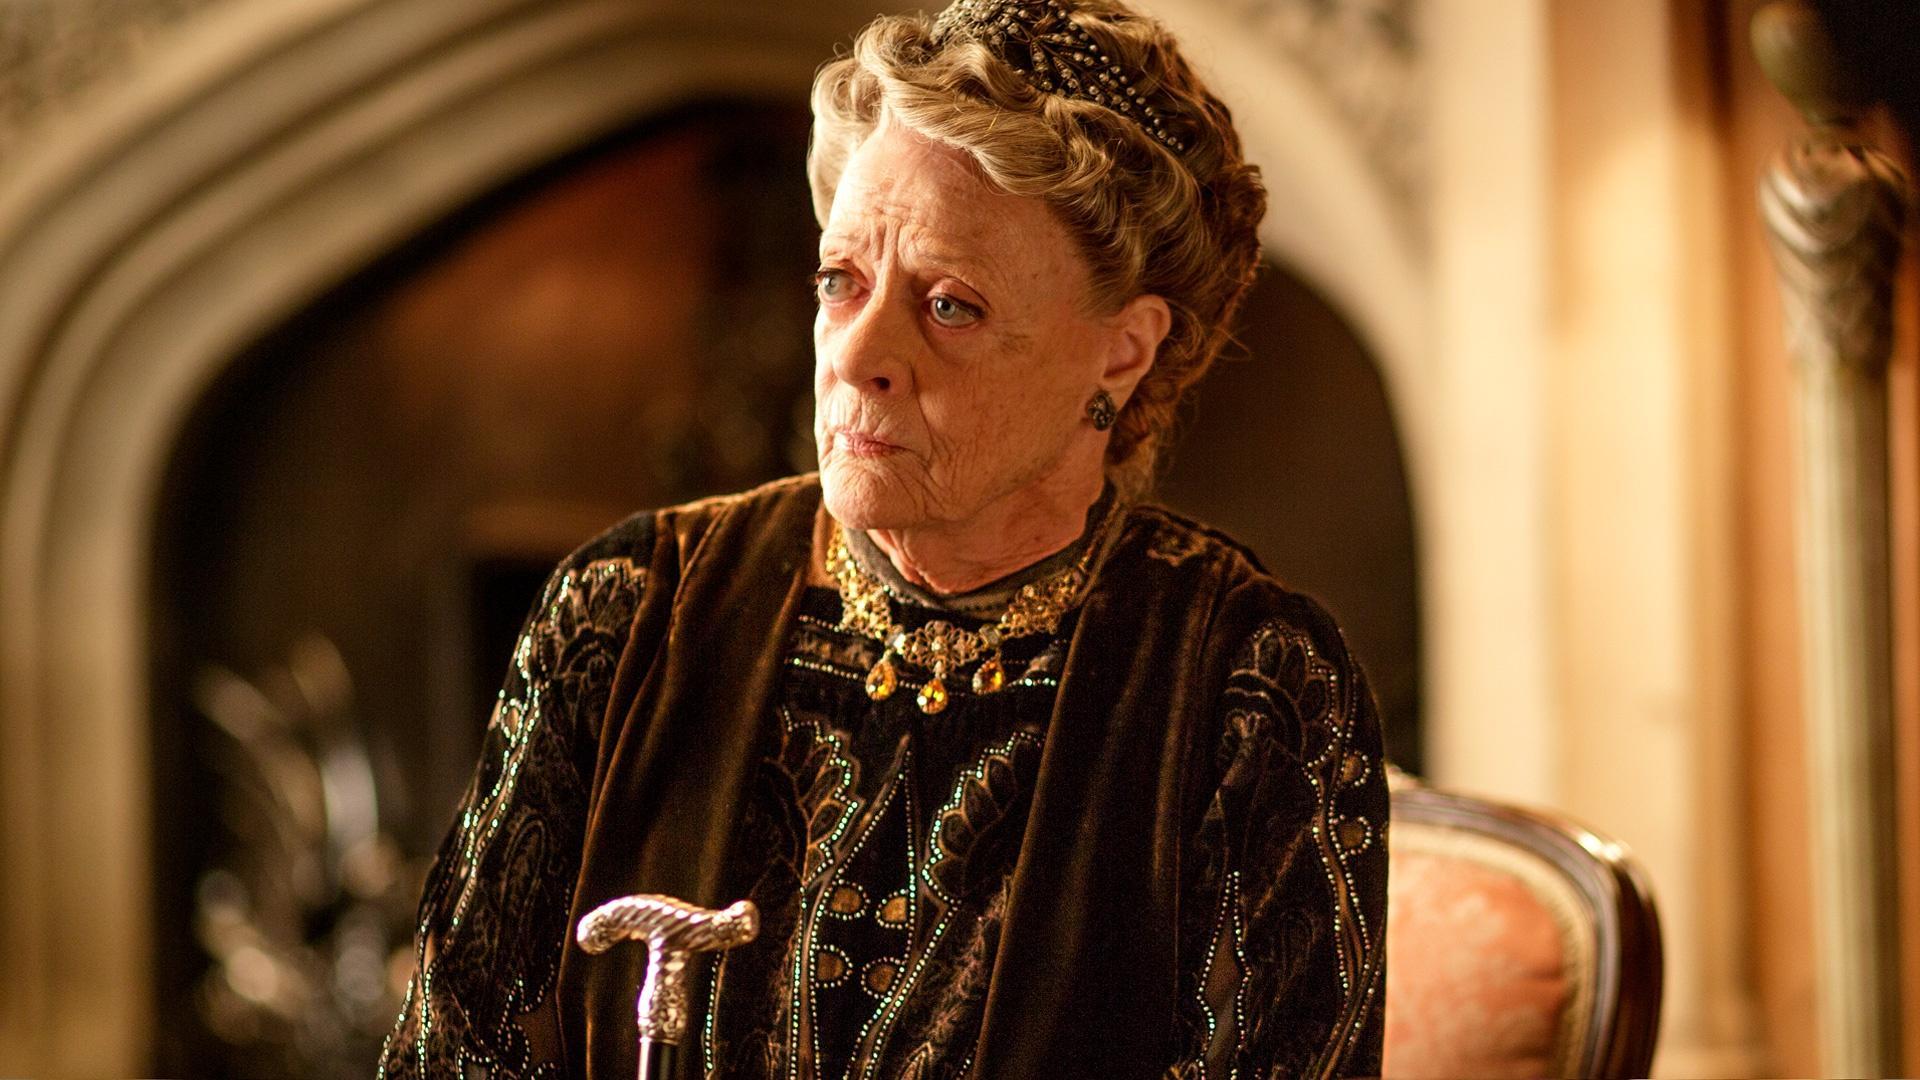 Downton Abbey - Season 5, Episode 5: Sunday, February 1 at 6pm